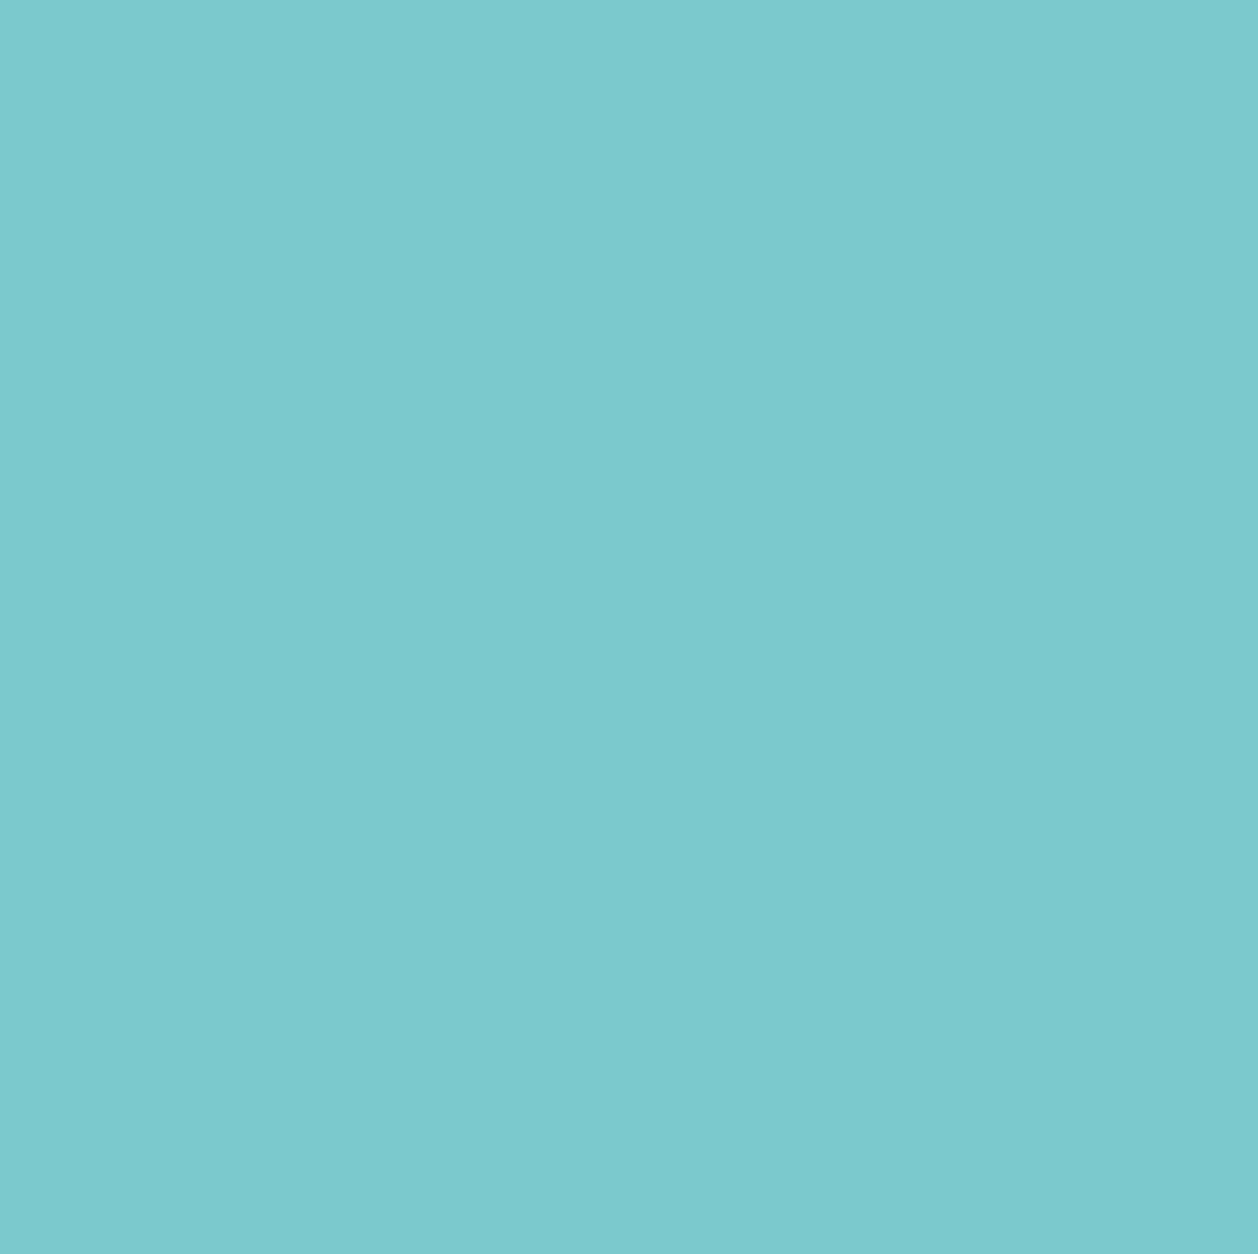 illy Y3.3 iperEspresso Amalfi Blue Swatch